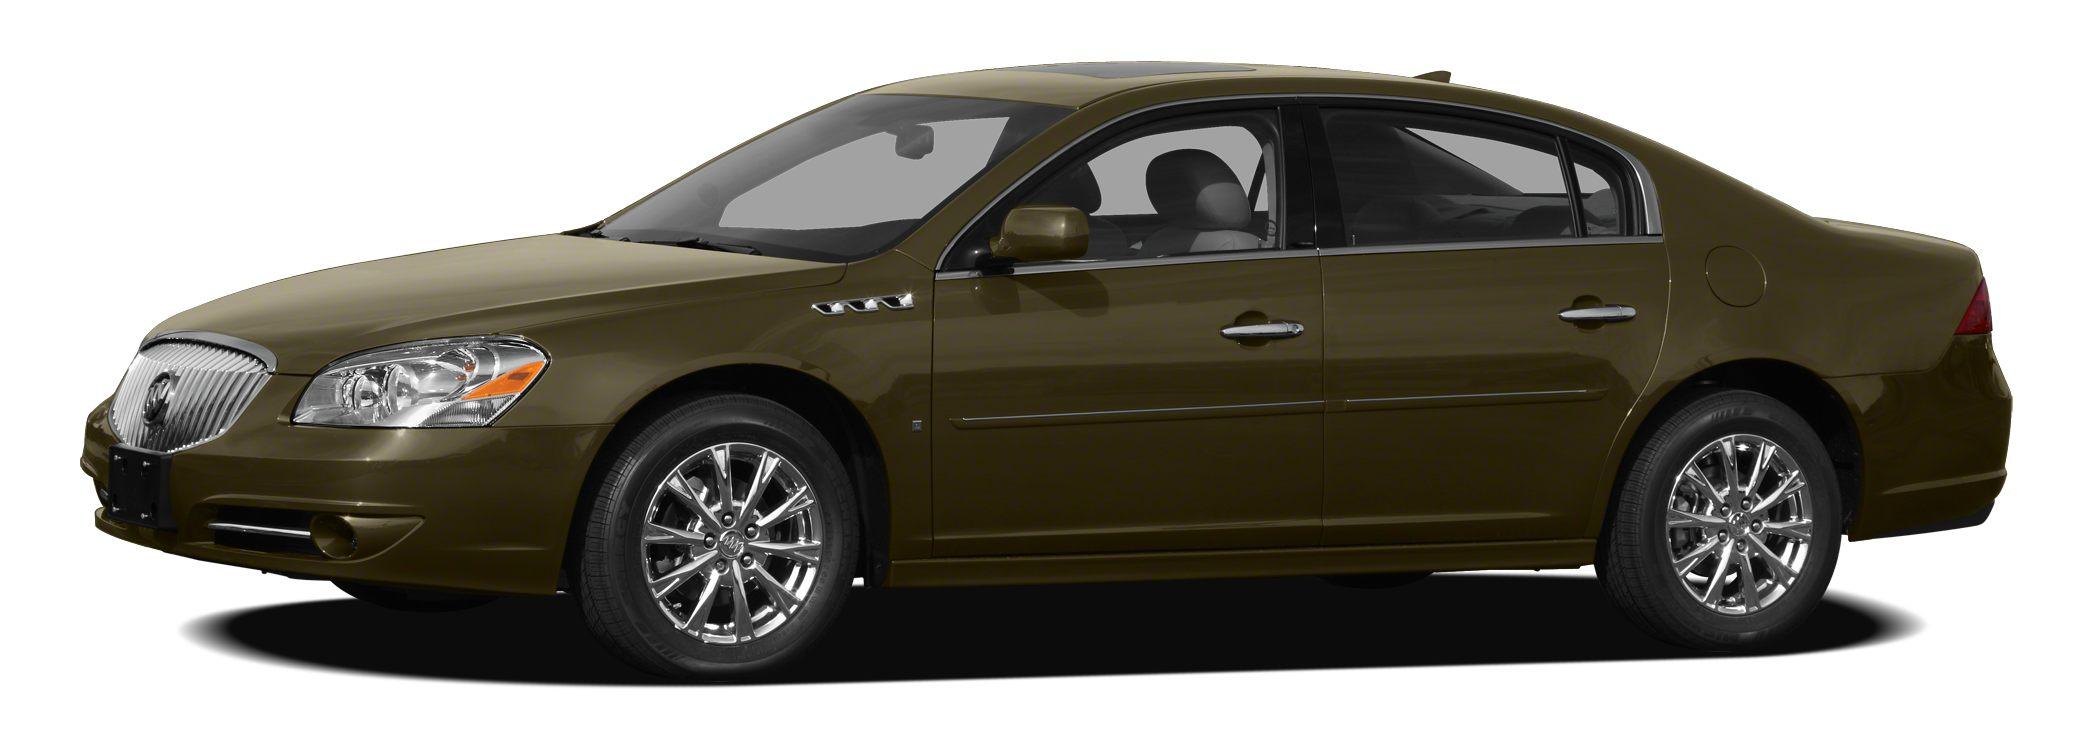 2010 Buick Lucerne CX Buick Lucerne 2010 CX Clean CARFAX Awards  2010 KBBcom 10 Most Comfortab